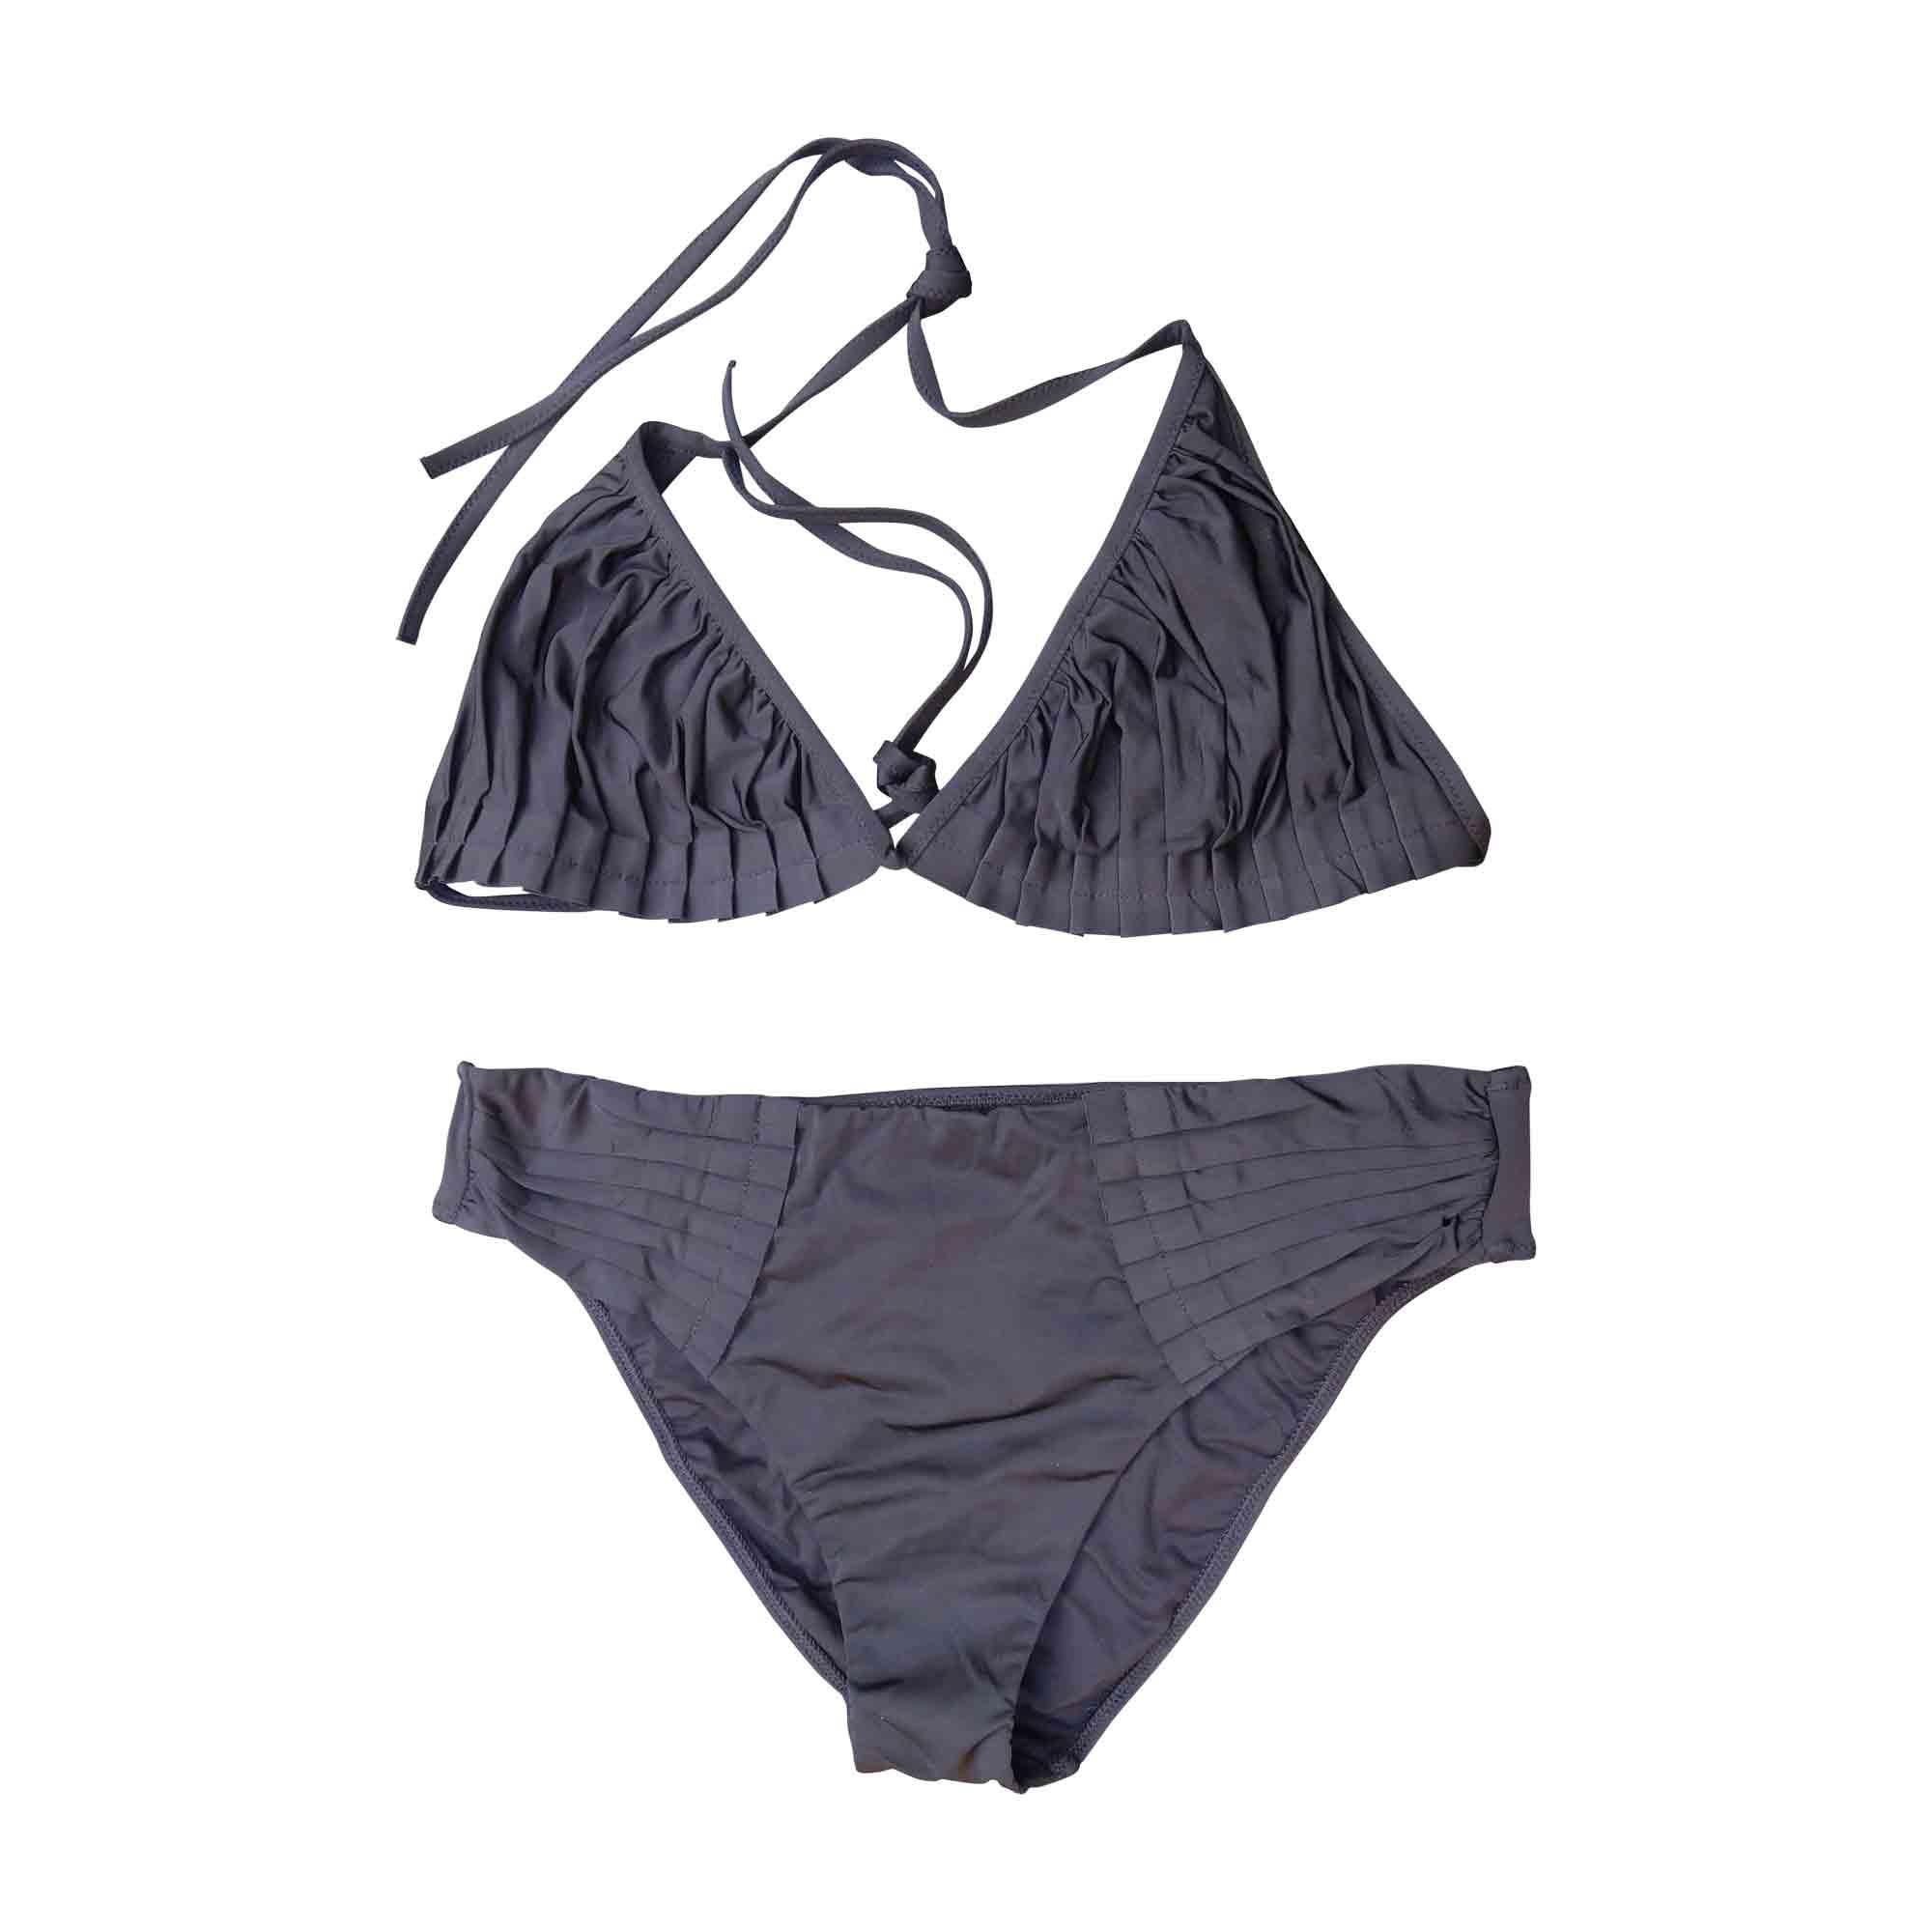 maillot de bain deux pi ces la perla 44 xl xxl t5 noir 6414517. Black Bedroom Furniture Sets. Home Design Ideas